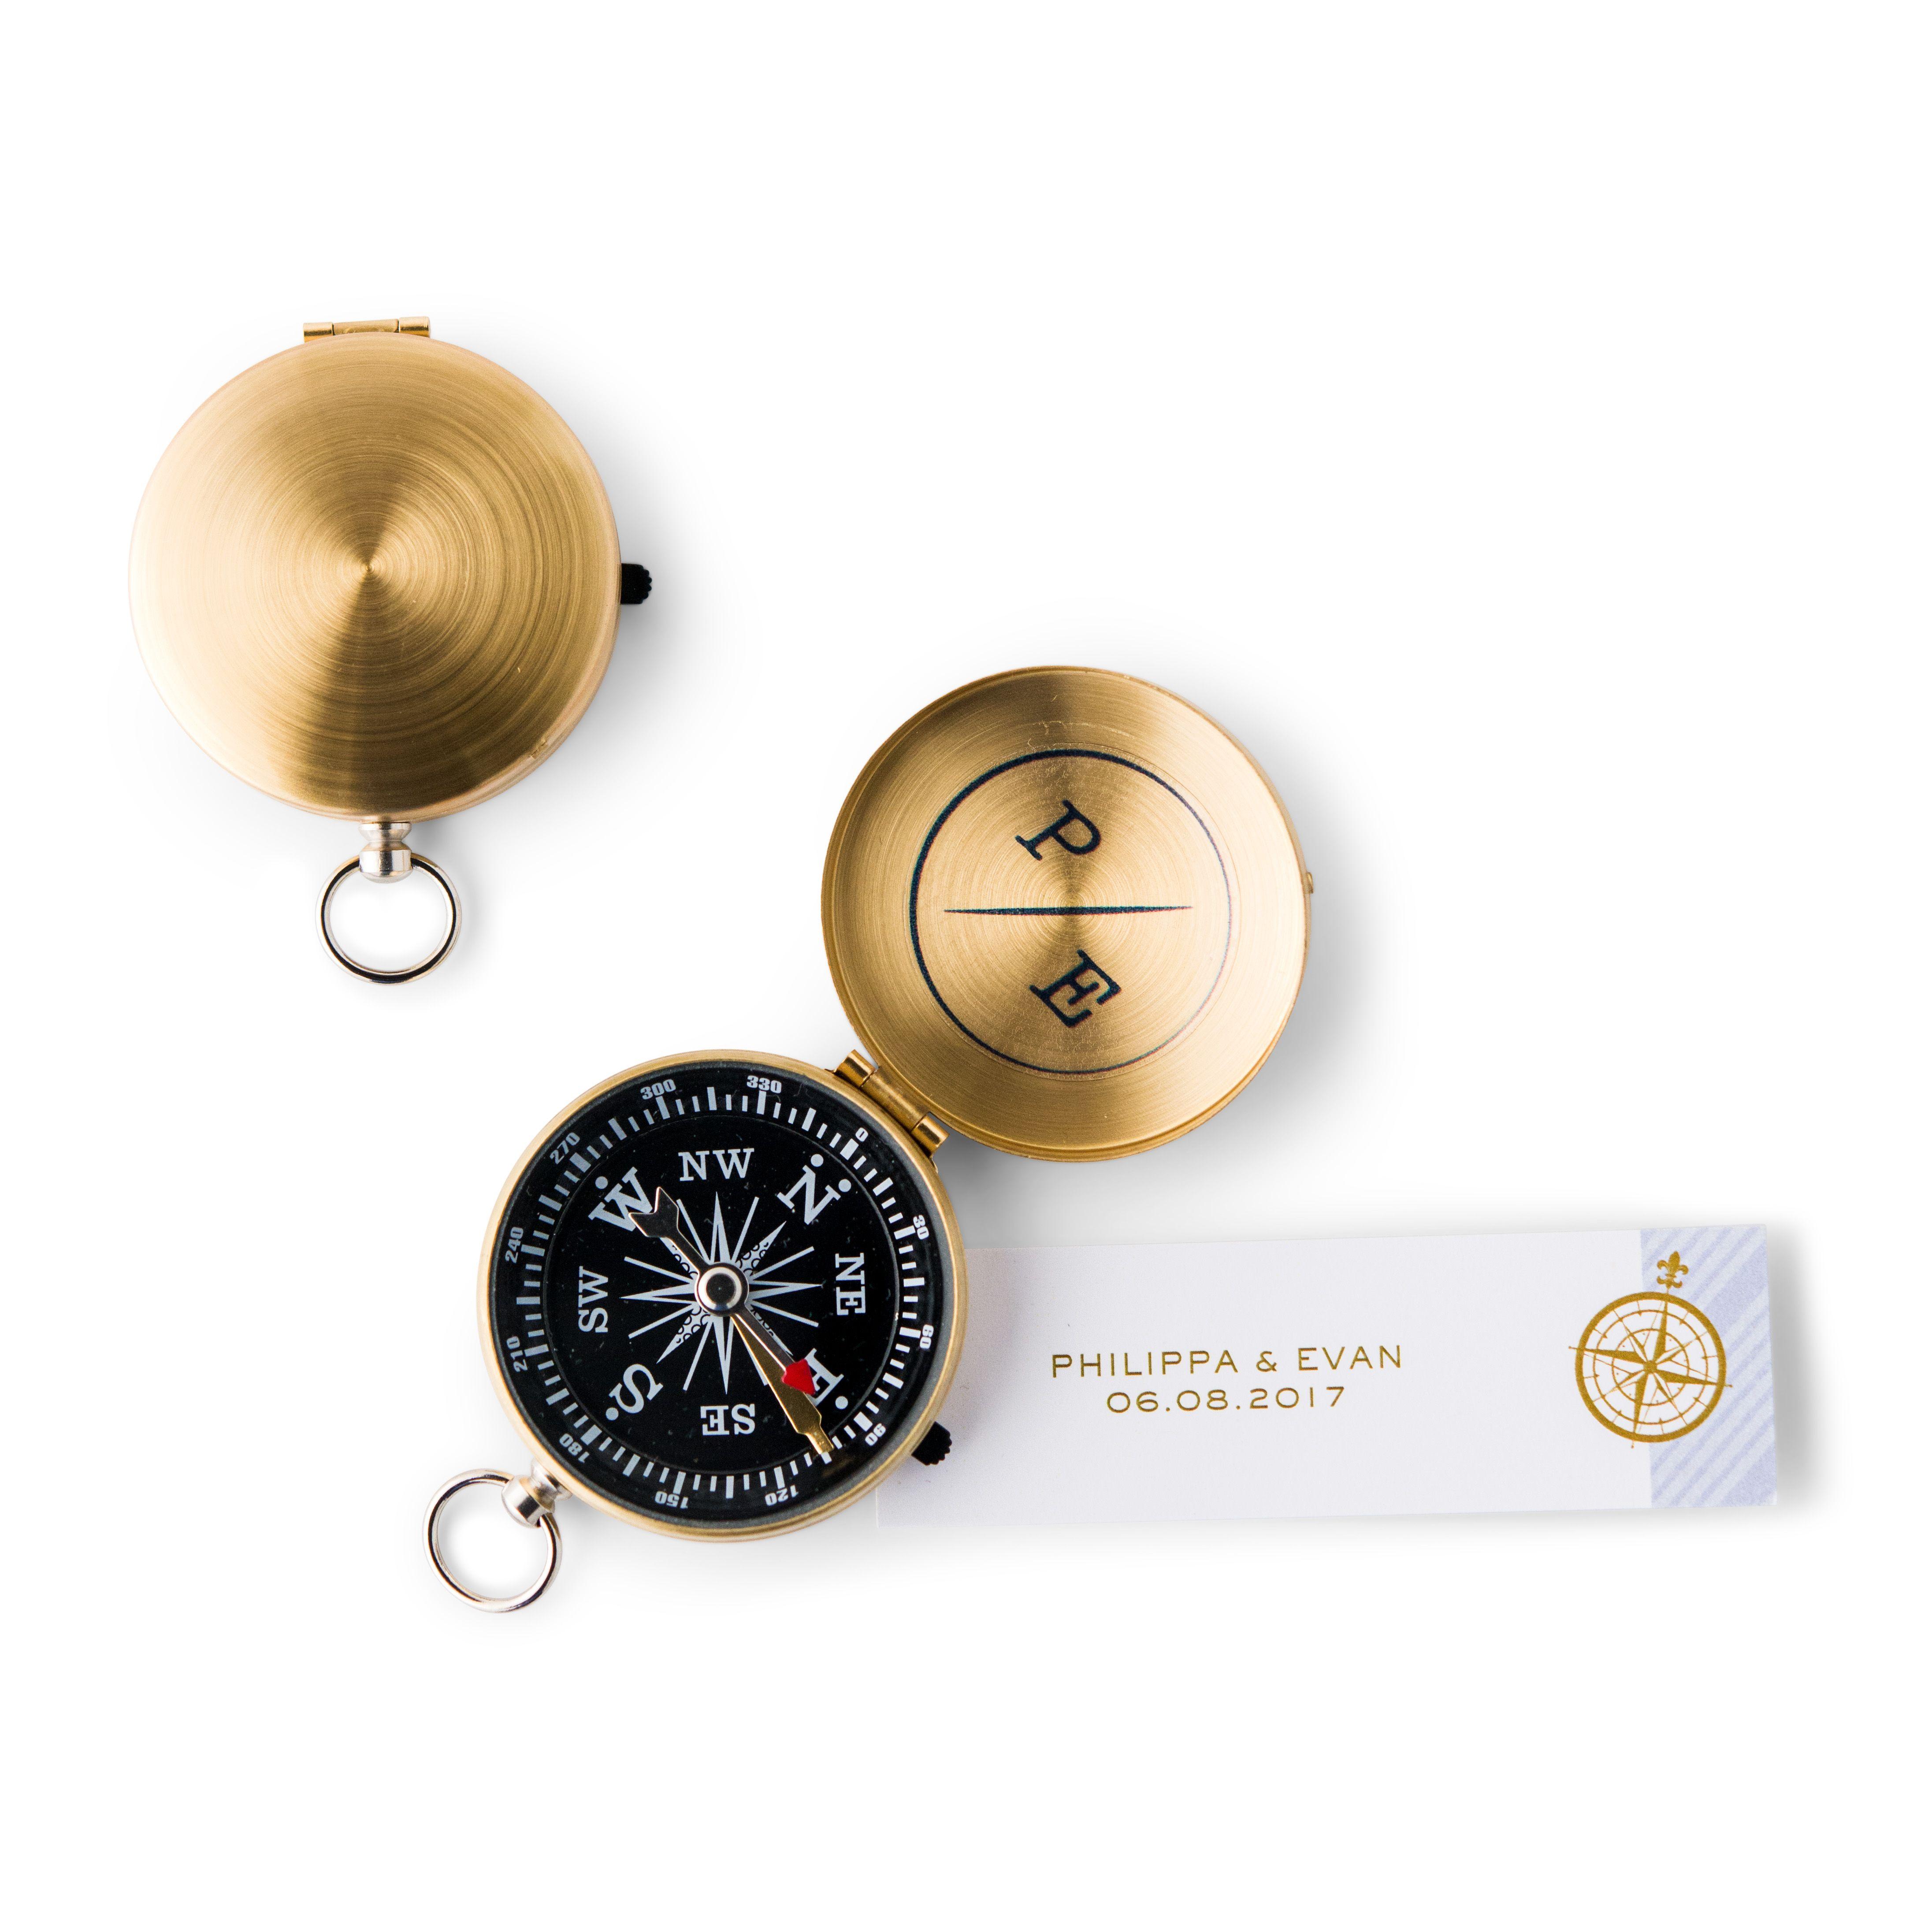 Gold Compass Wedding Favor | Compass, Favors and Nautical wedding favors